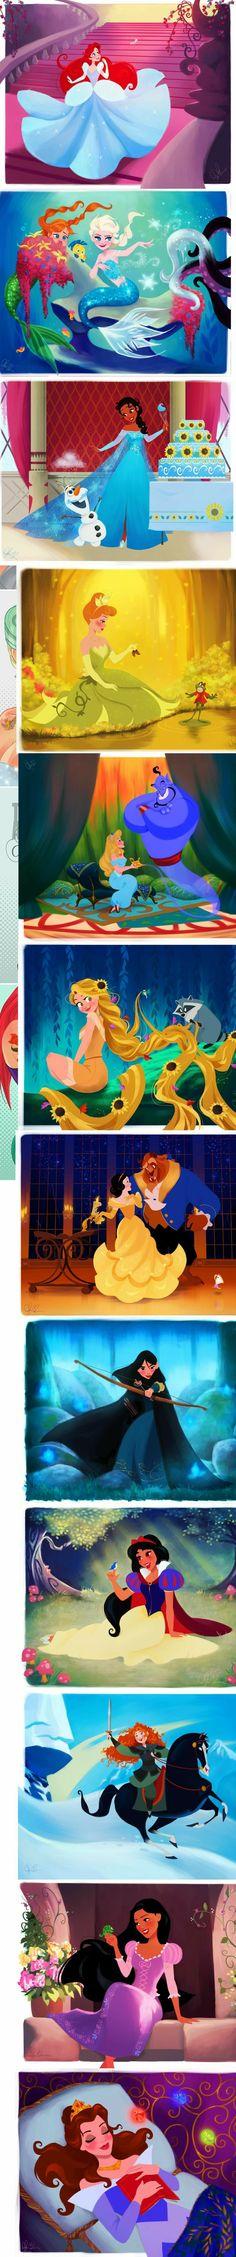 Tiana as Elsa! Cinderella as Tiana! Snow White as Belle! Mulan as Merida! Jasmine as Snow White! Merida as Mulan! Belle as Aurora! Disney Animation, Disney Pixar, Disney Fan Art, Disney And Dreamworks, Disney Characters, Funny Disney Memes, Disney Jokes, Disney Facts, Funny Memes